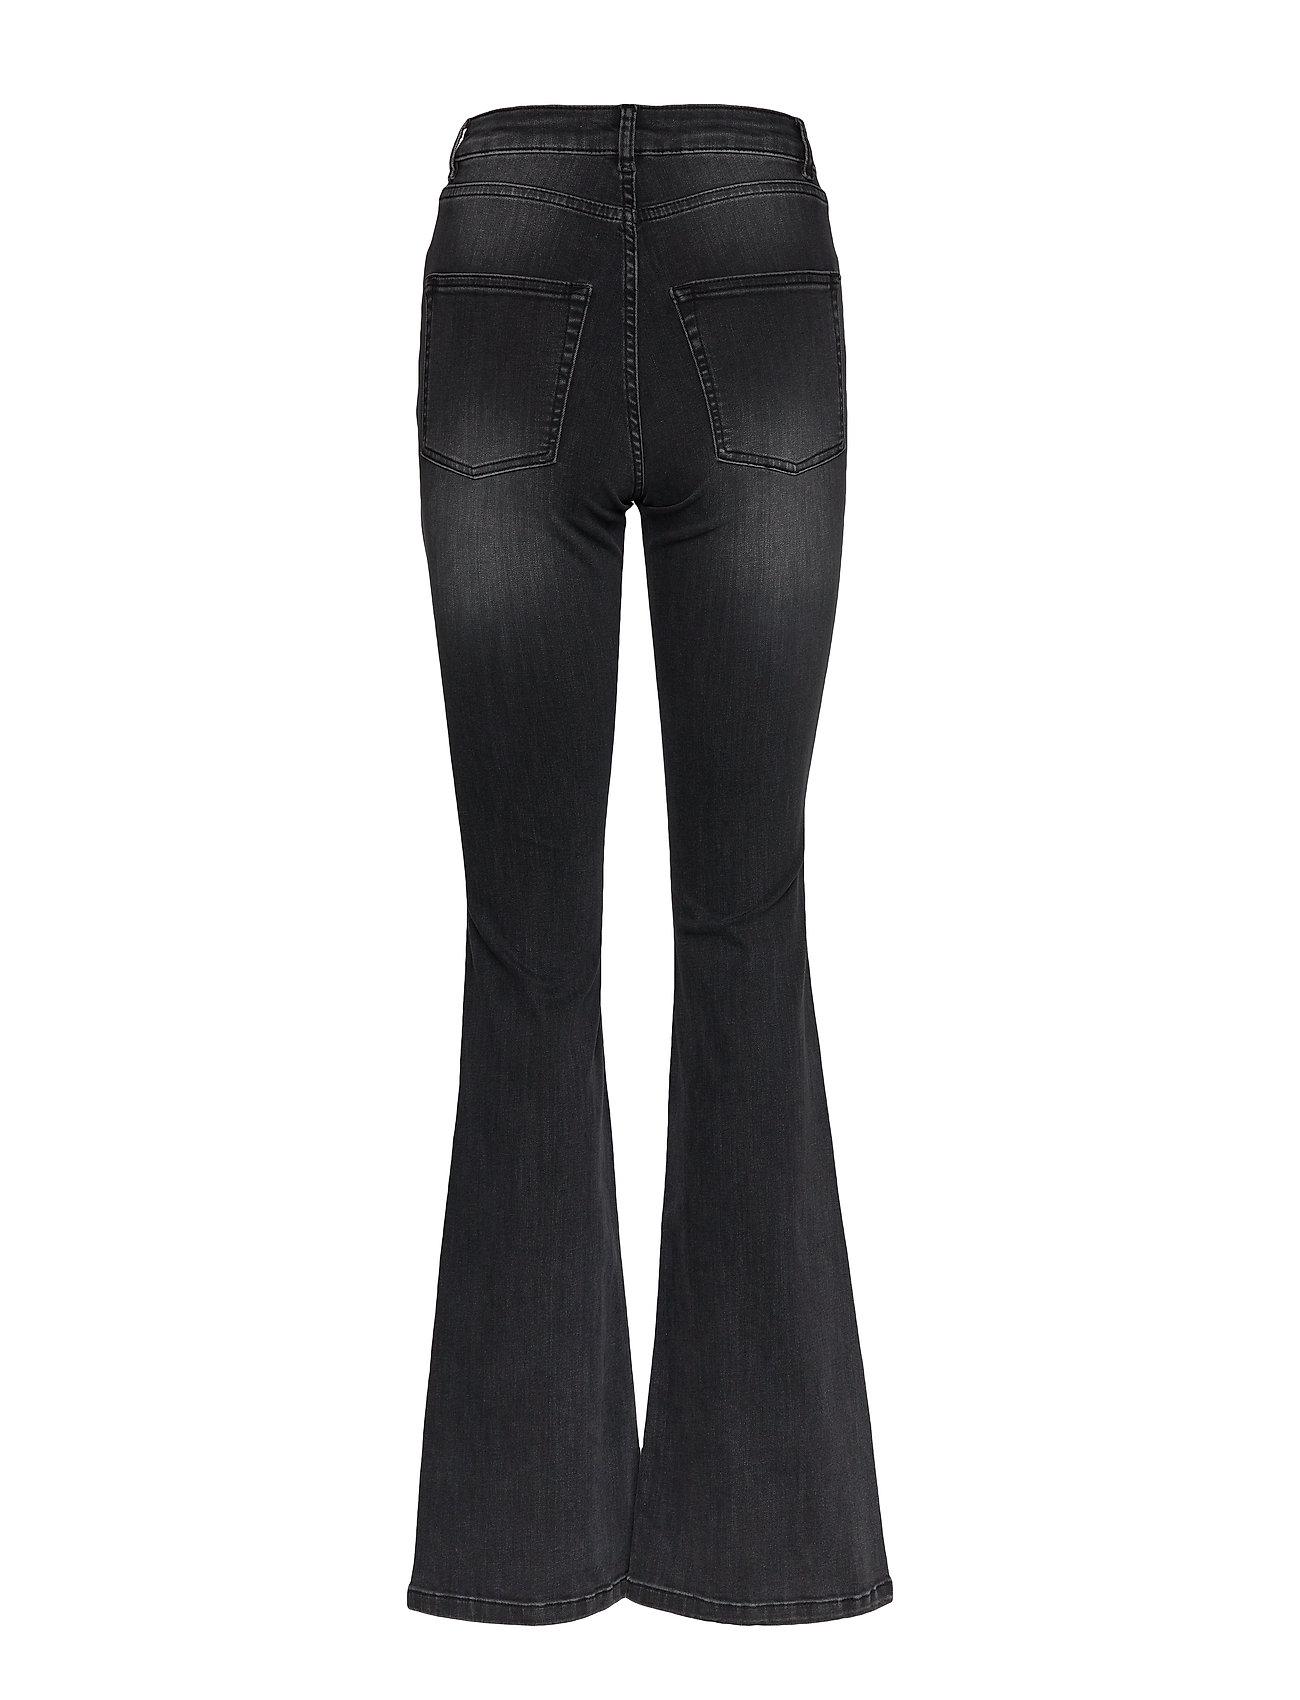 Gestuz Emilindagz Jeans Noos (Charcoal Grey), 599.40